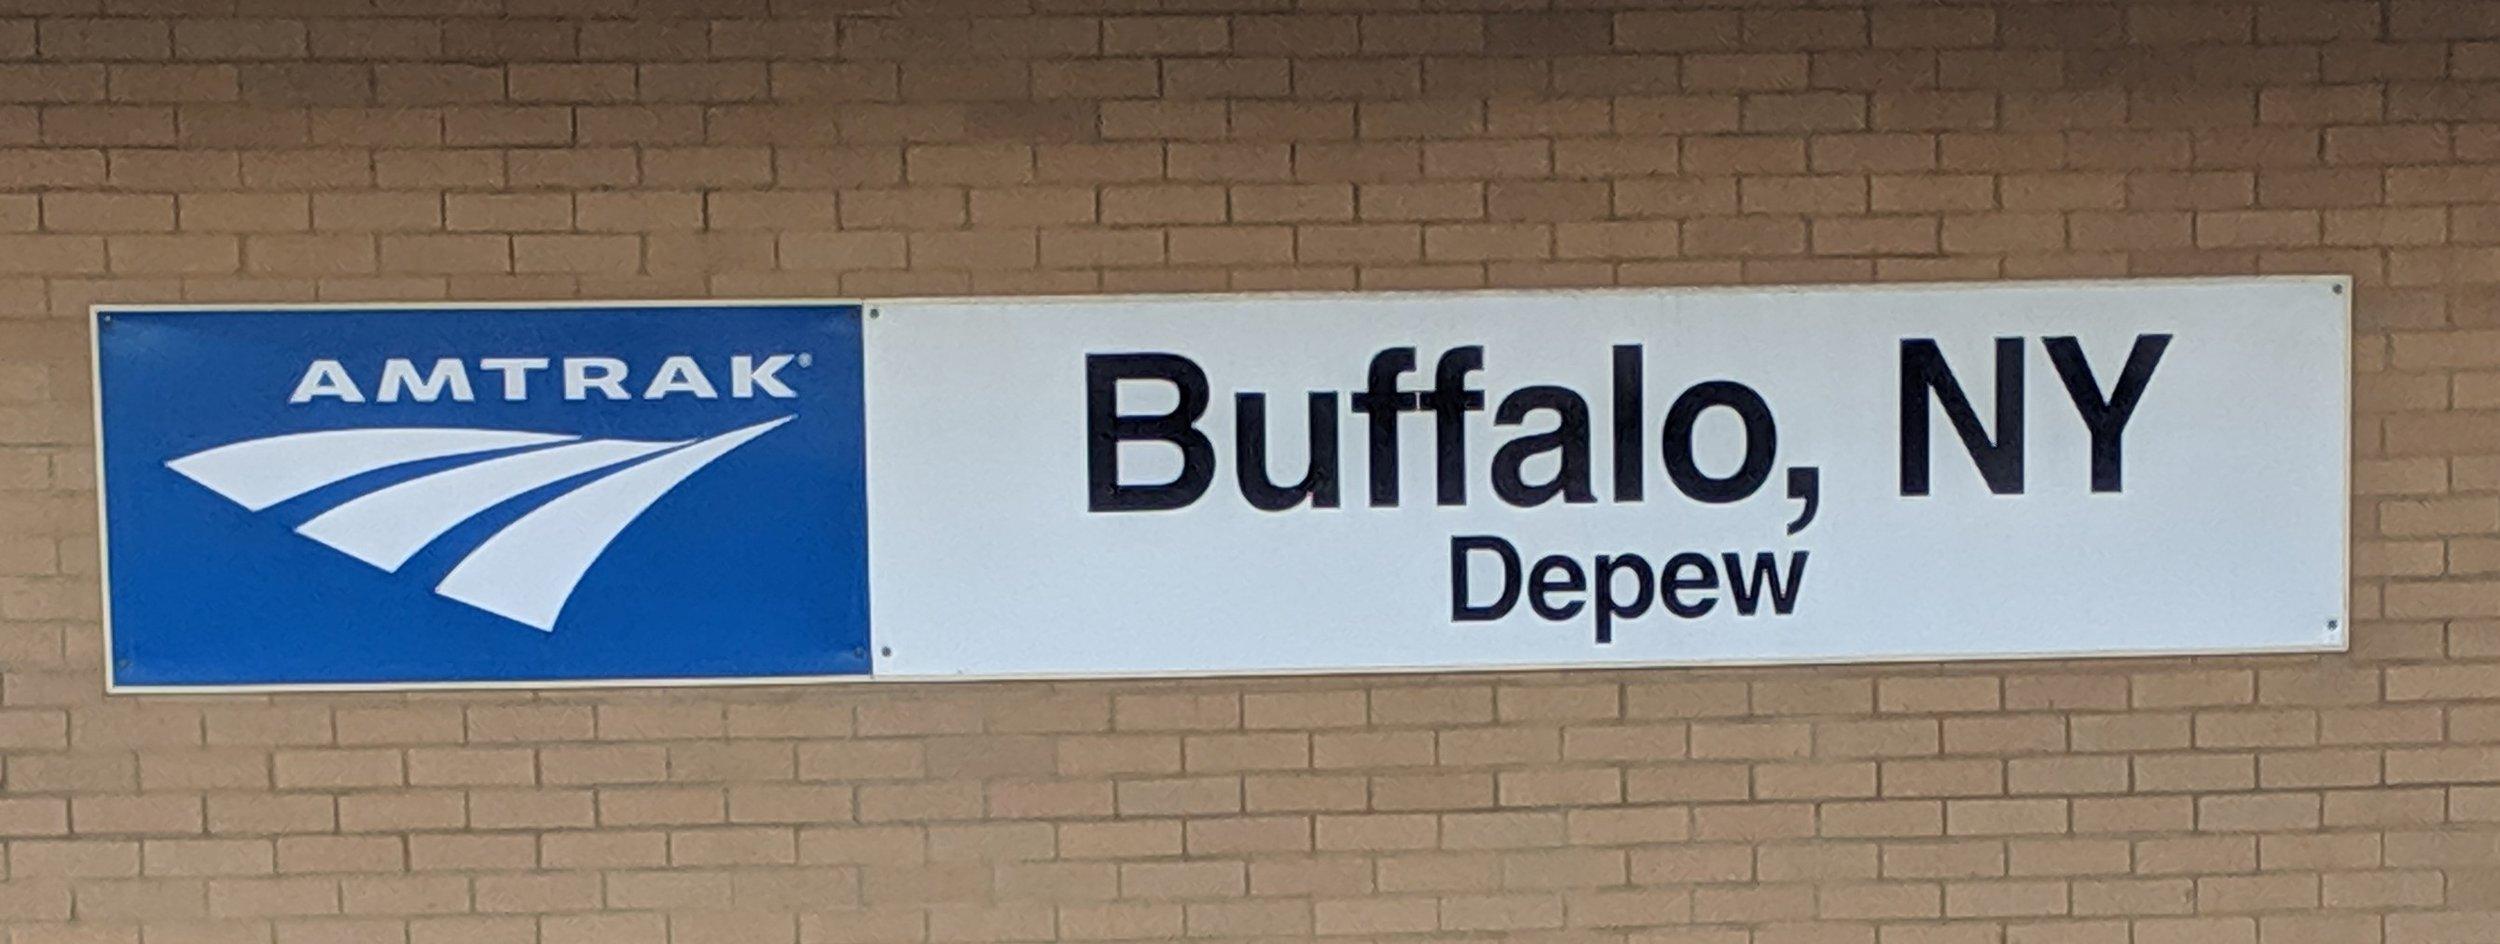 Depew Train Station.jpg